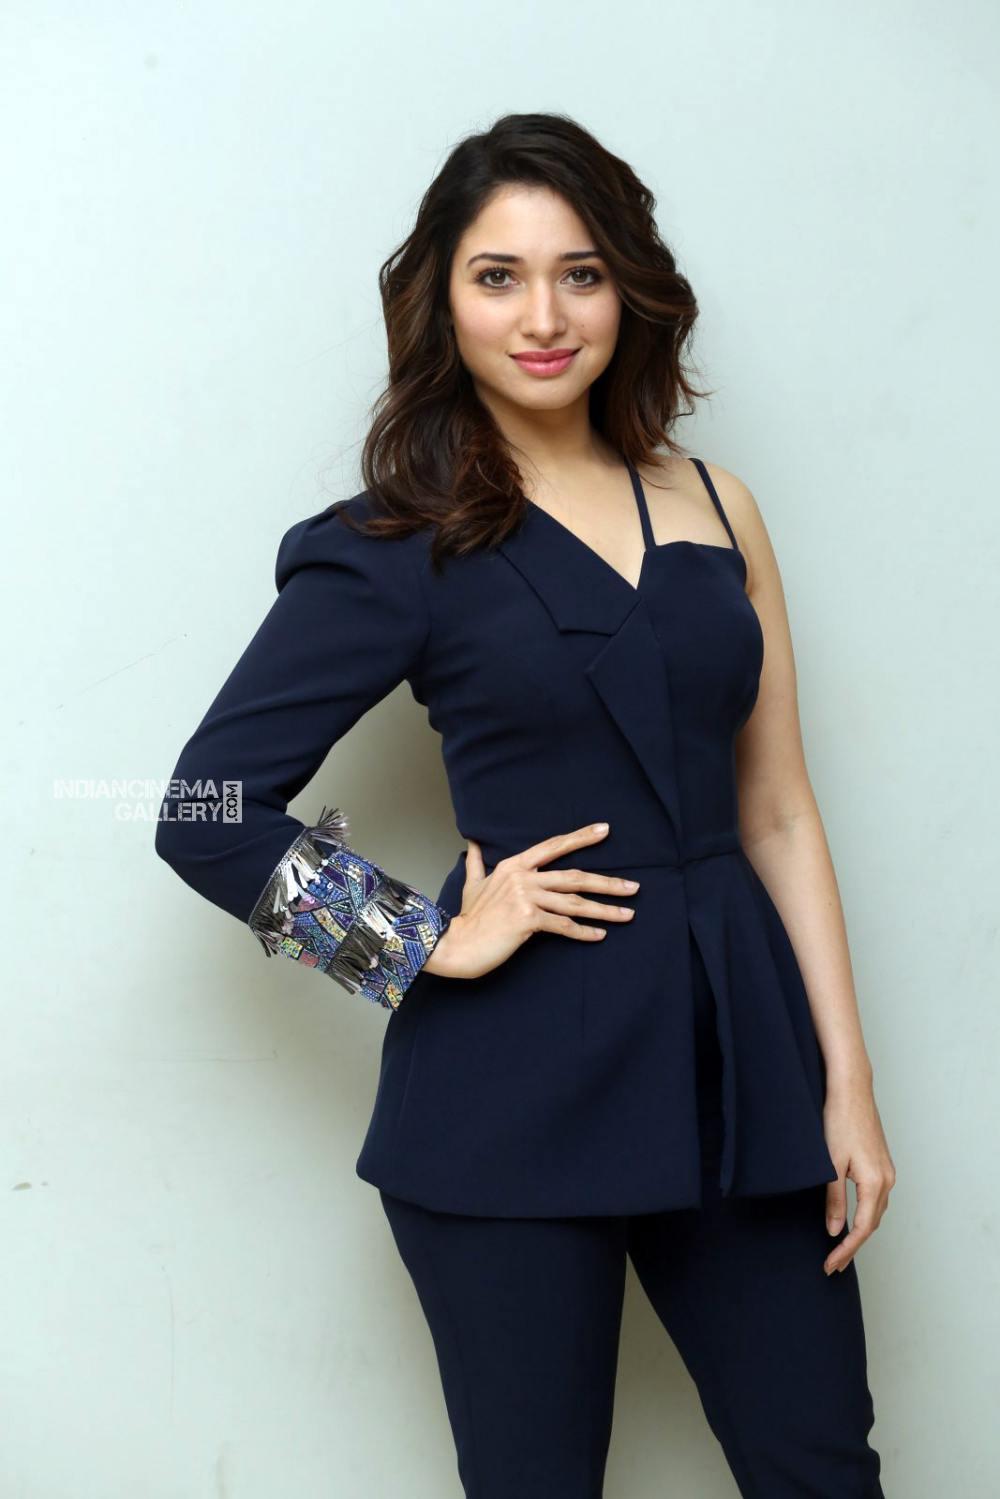 Tamanna Bhatia at f2 movie trailer launch (2)